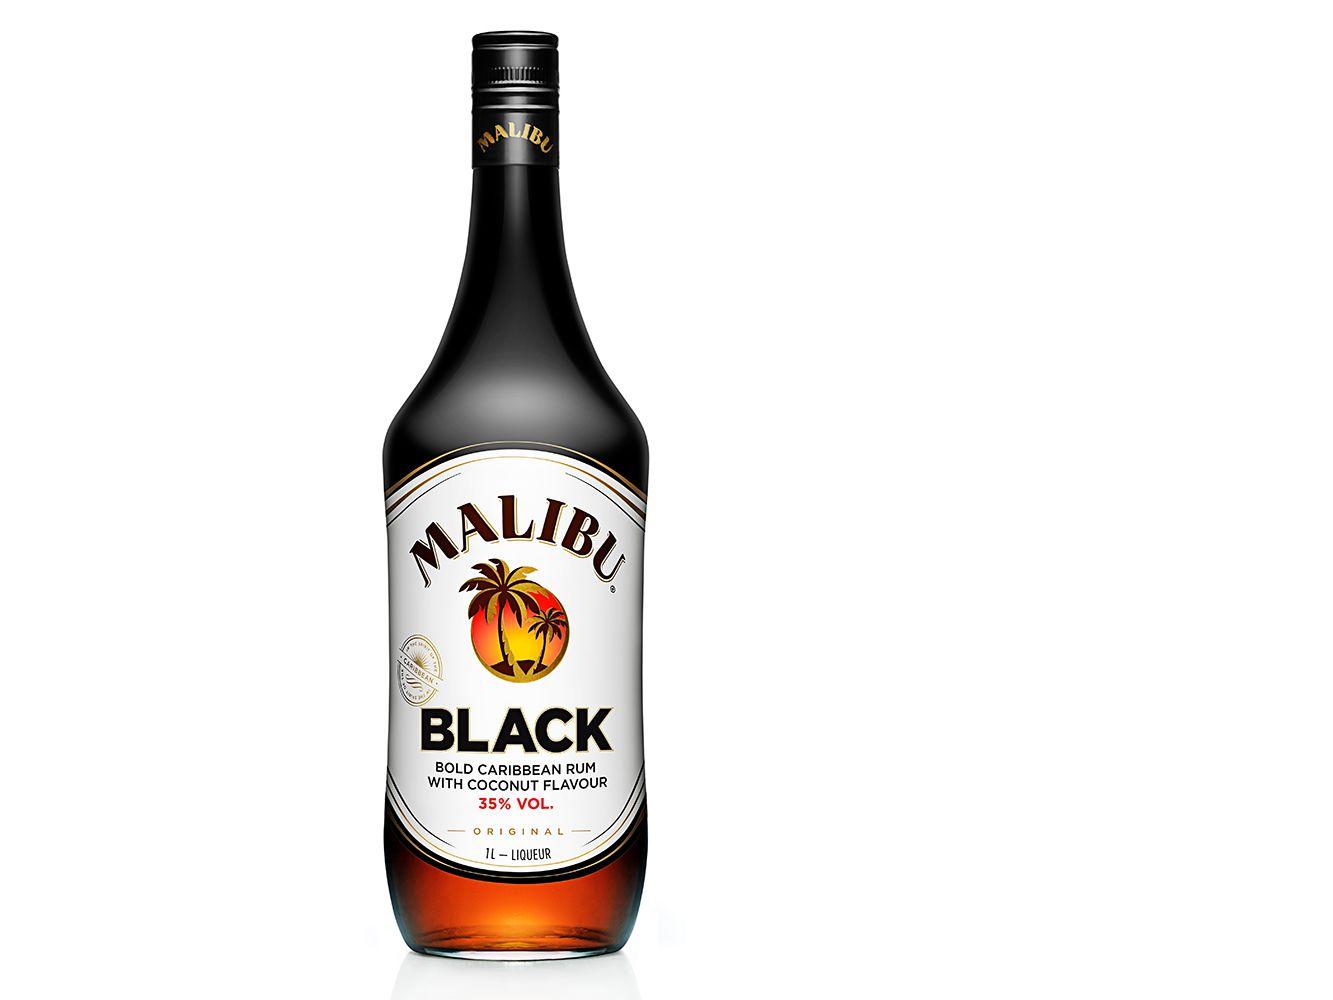 A Critique of Malibu Black Coconut Rum